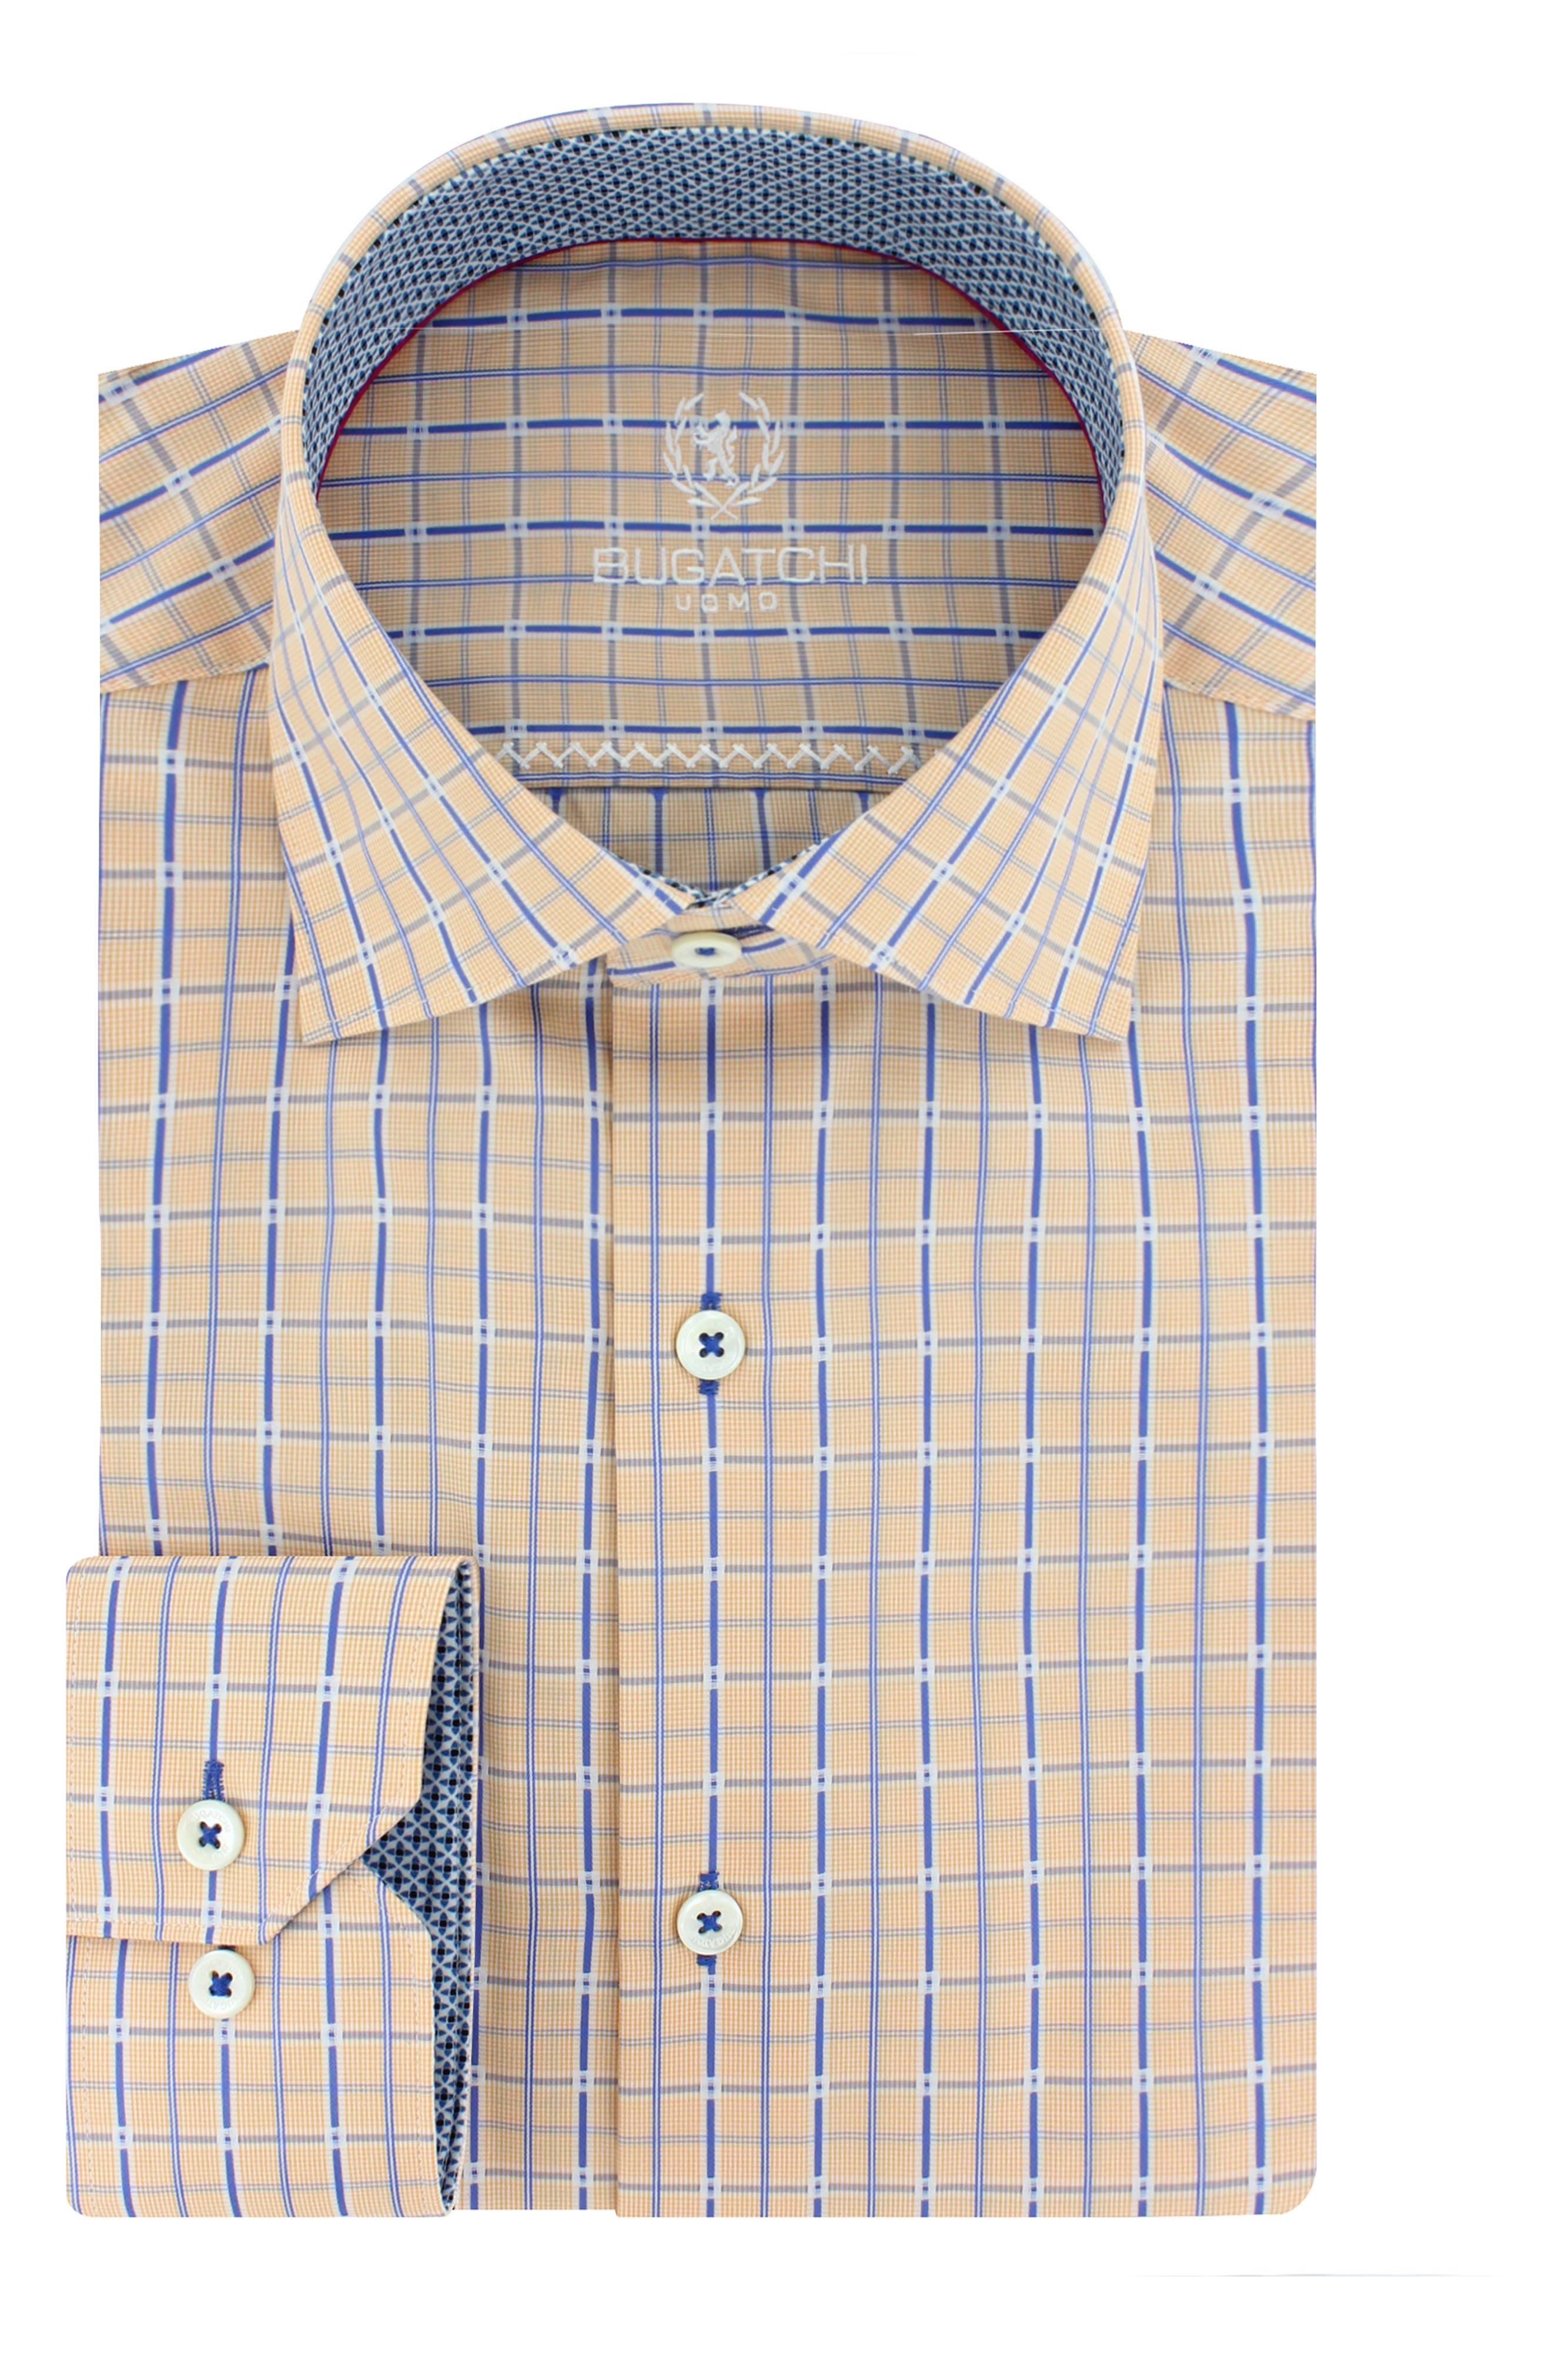 Bugatchi Trim Fit Grid Check Dress Shirt